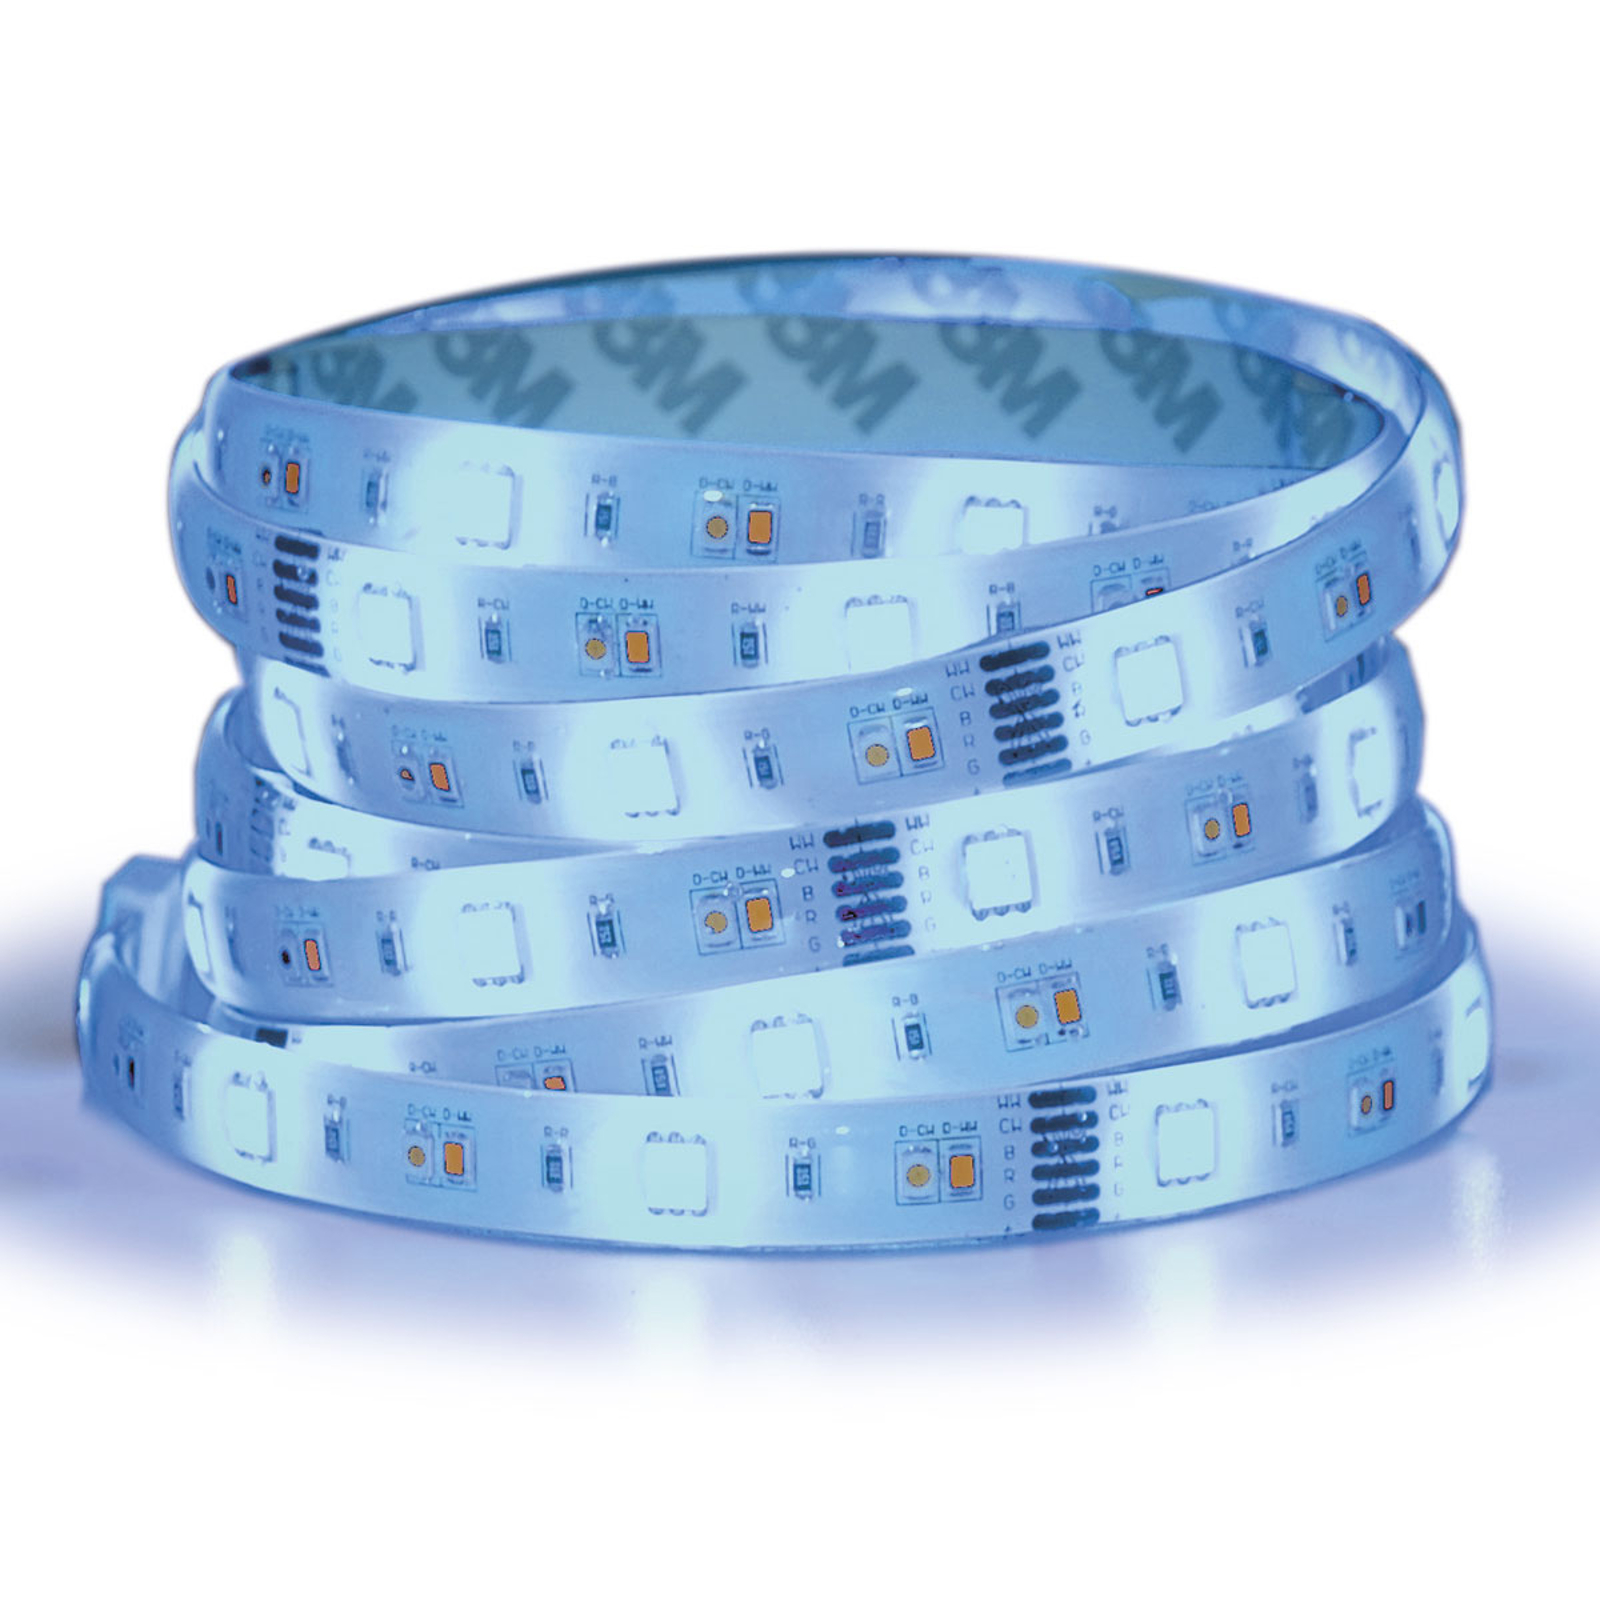 AwoX SmartLIGHT LED-Strip Basisset 2m